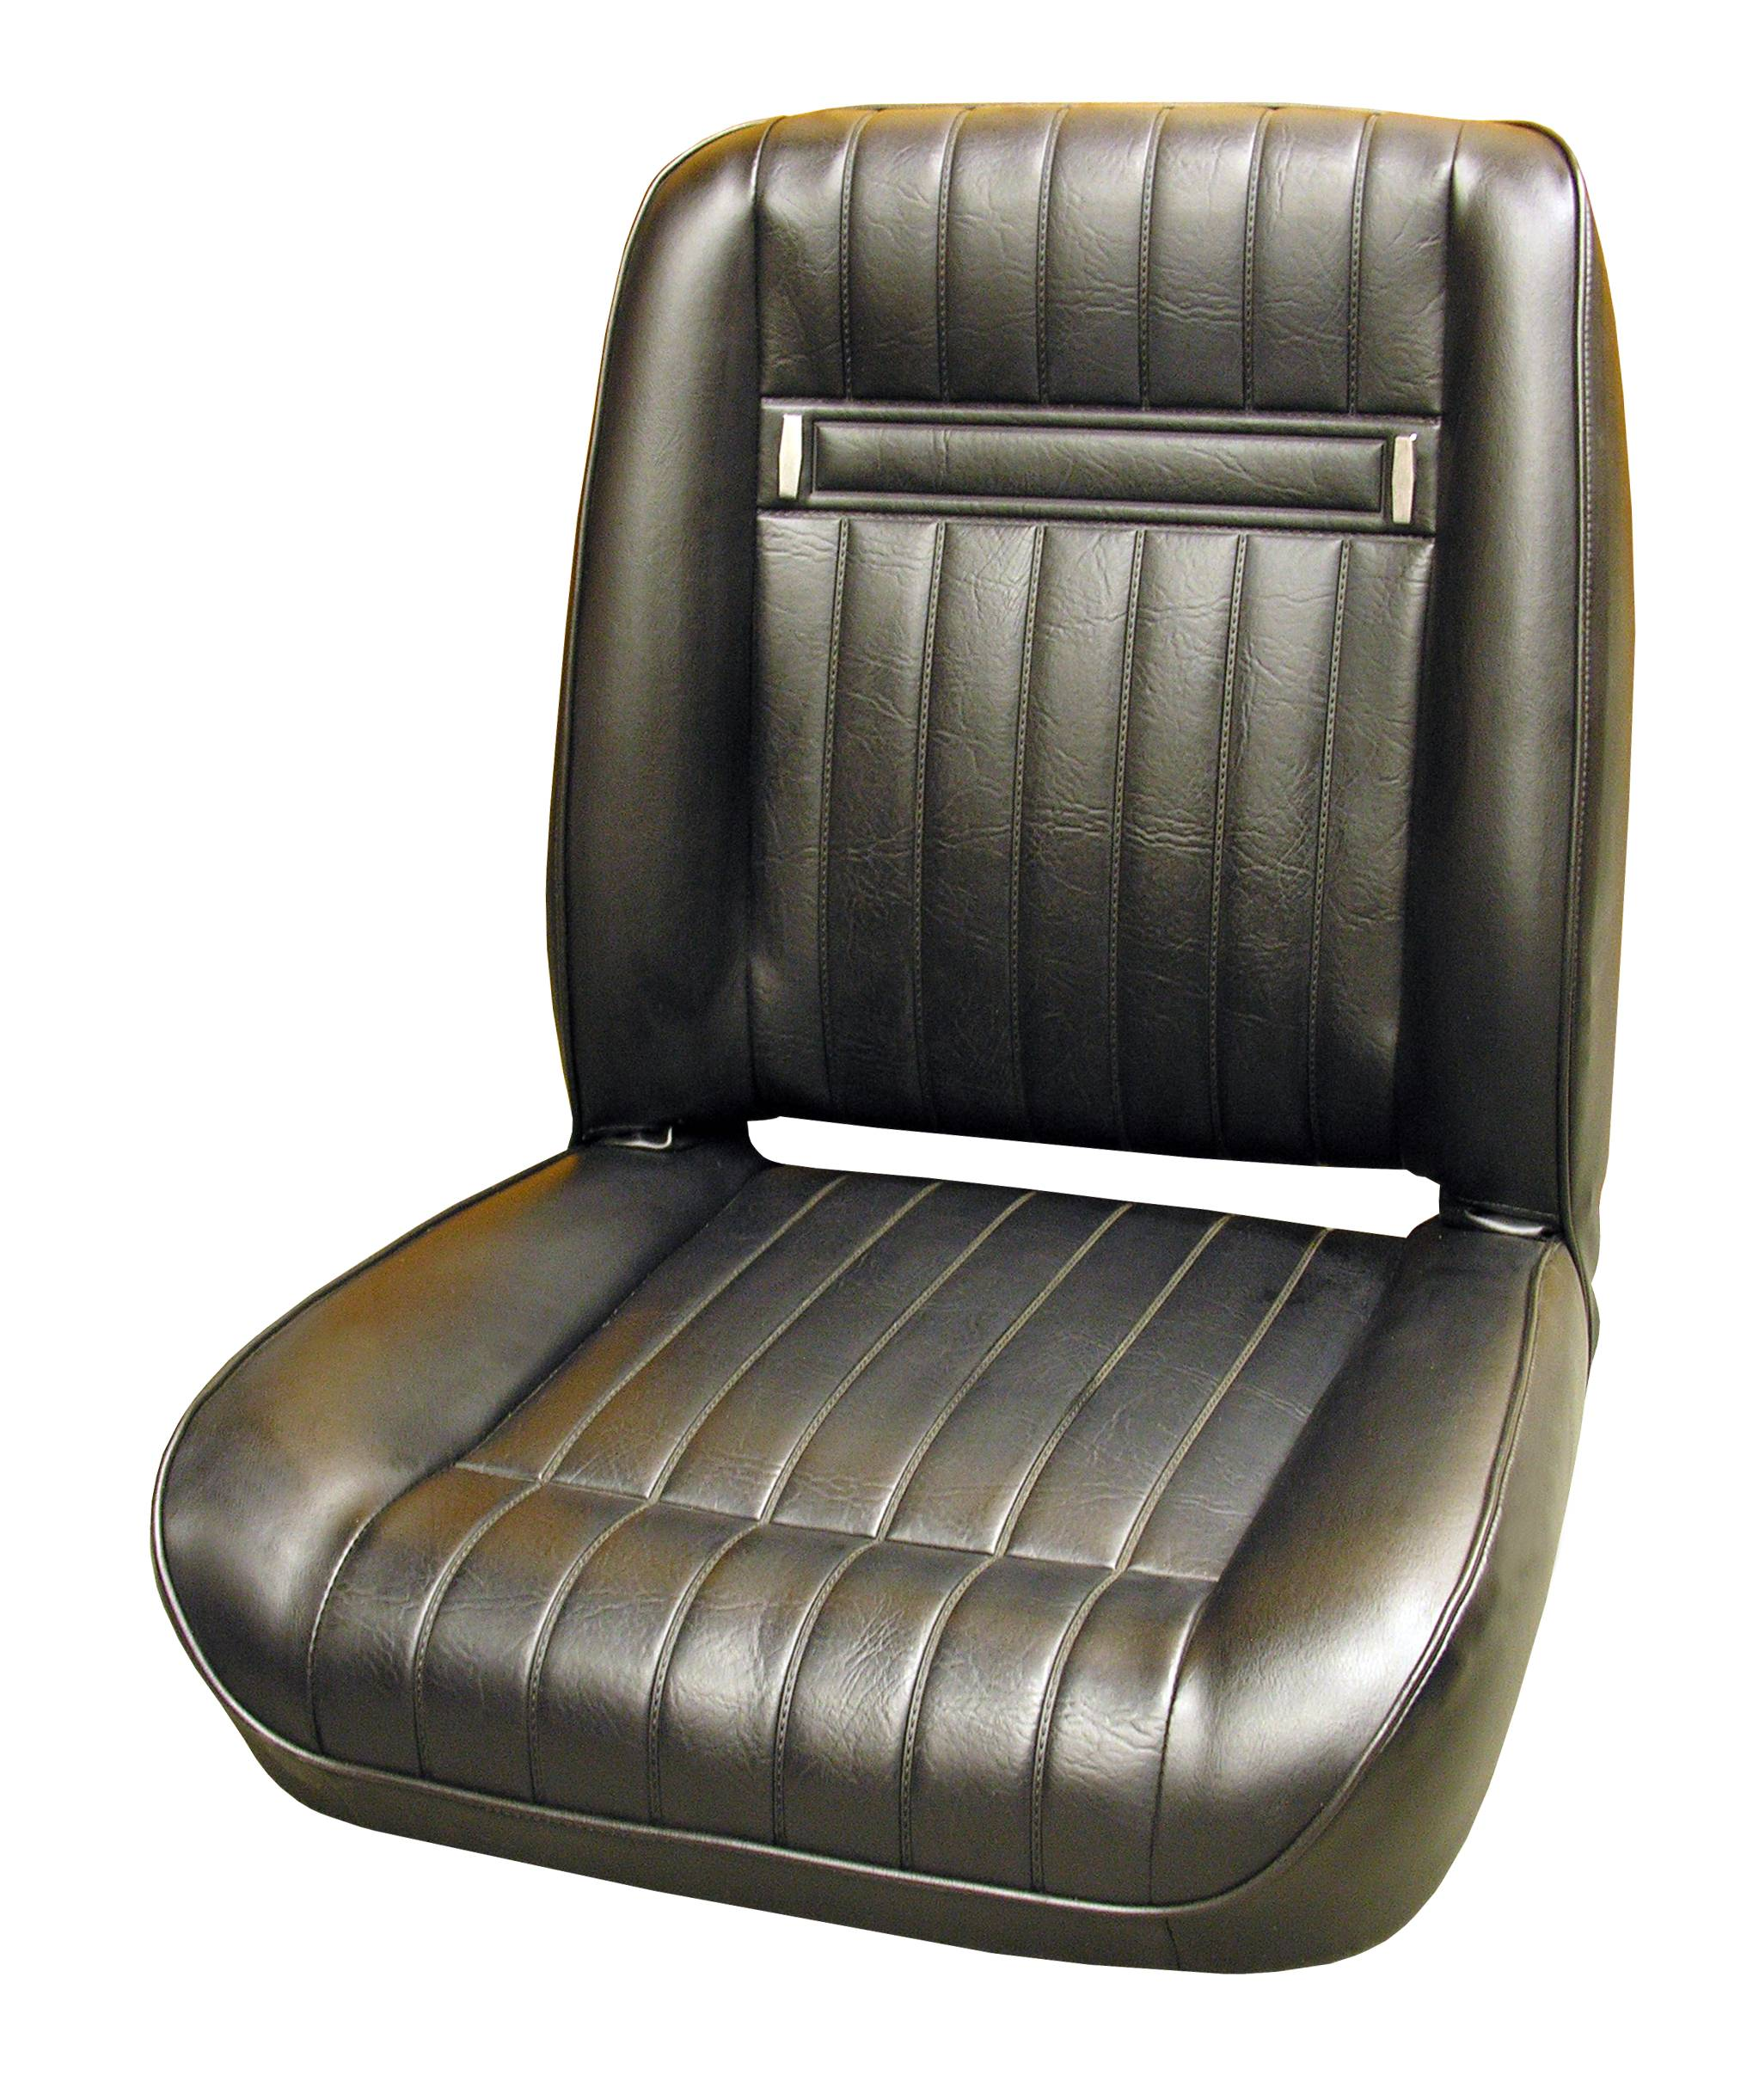 76 79 Dodge Truck D W Series Bucket Seat Upholstery Black Legendary Auto Interiors